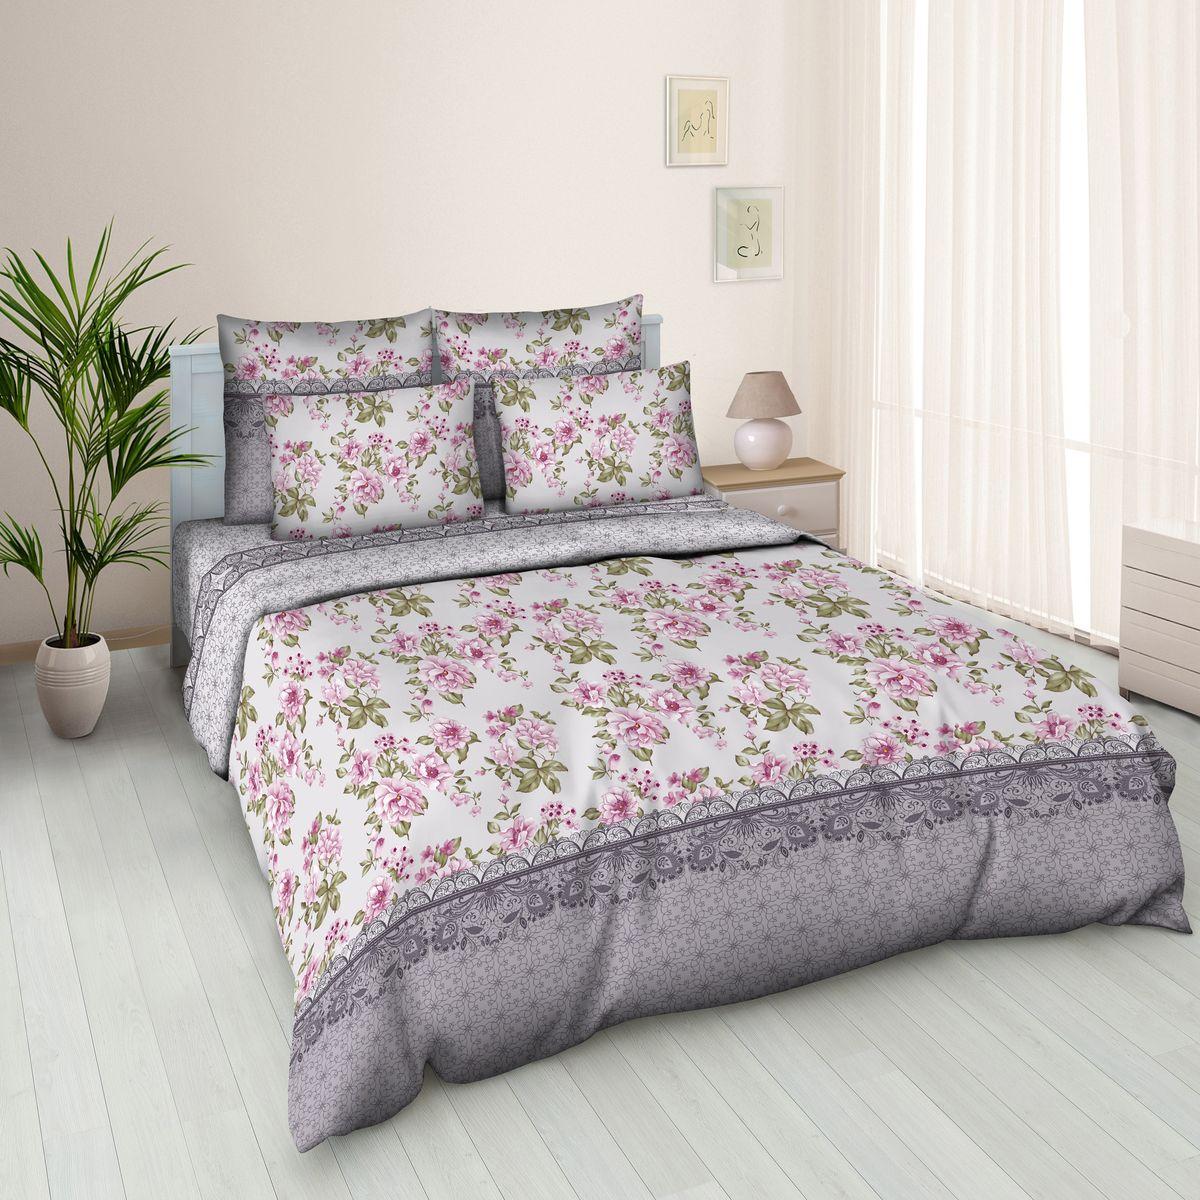 Комплект белья Amore Mio Tochka, 2-спальный, наволочки 70х70 комплект белья amore mio light евро наволочки 70х70